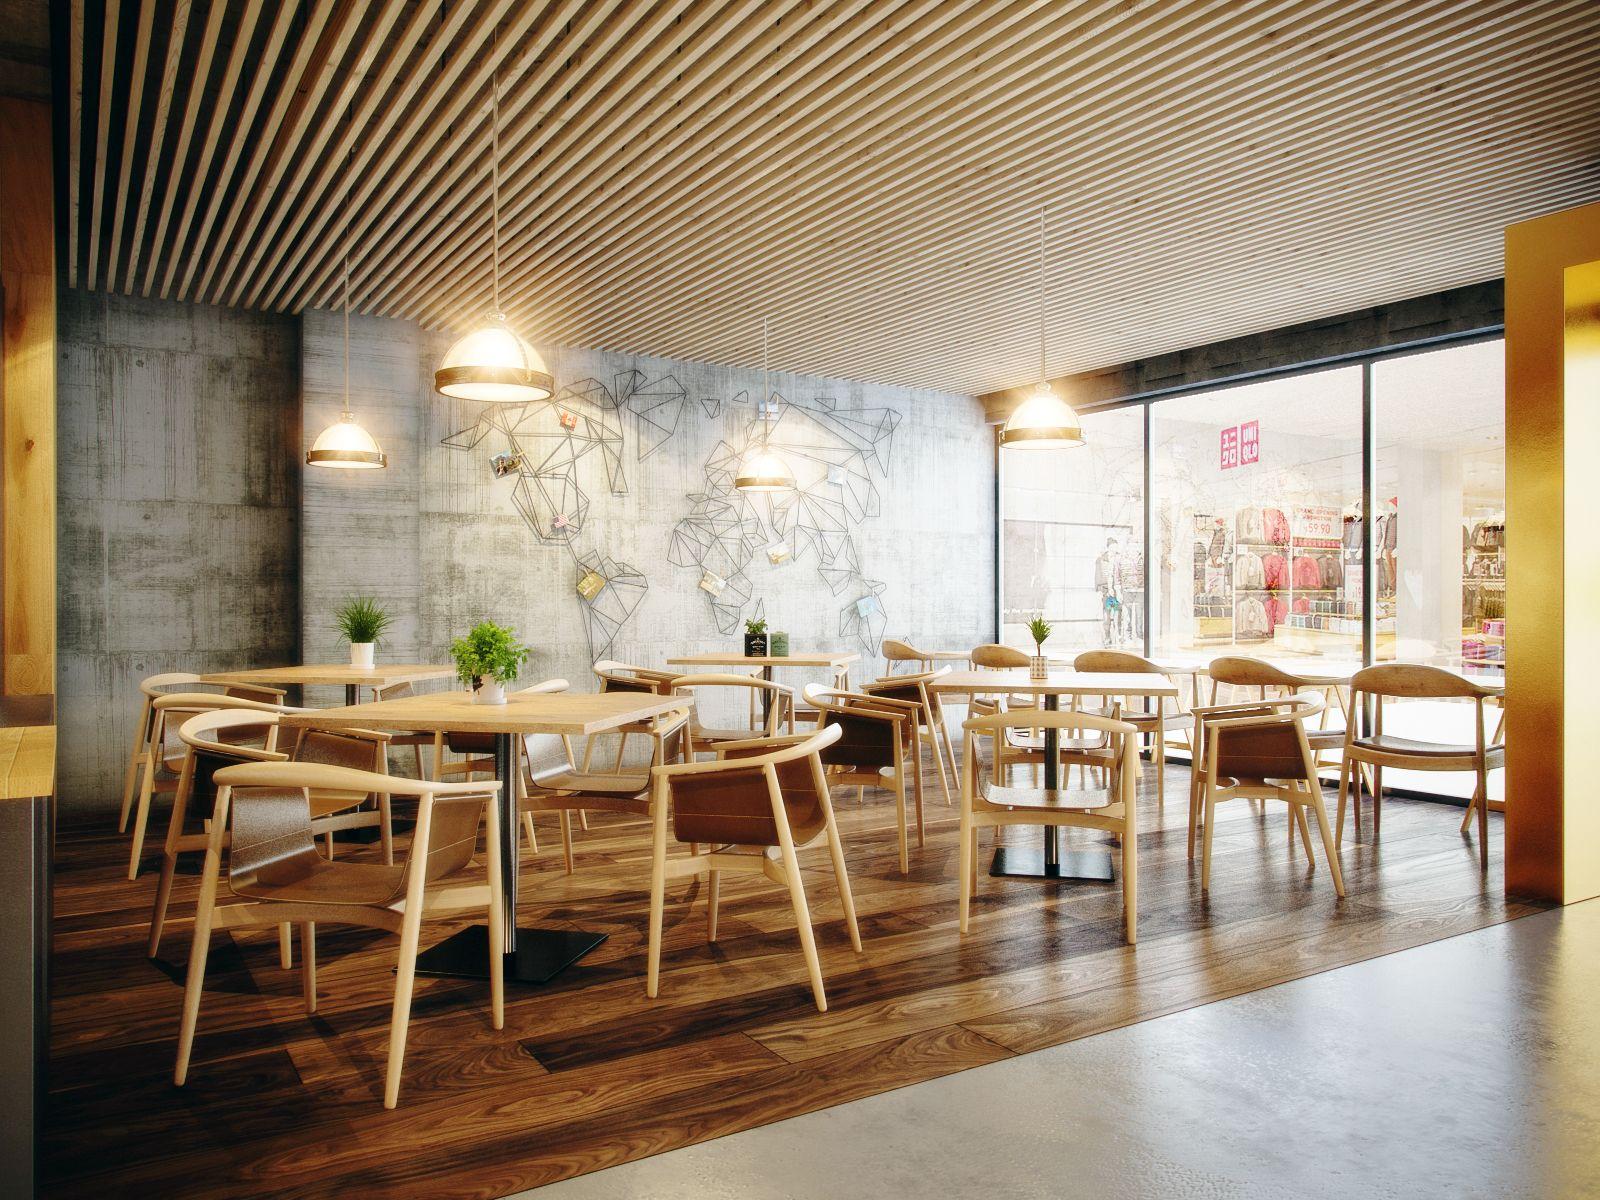 This Coffee Shop Is In Myanmar Design & Render By